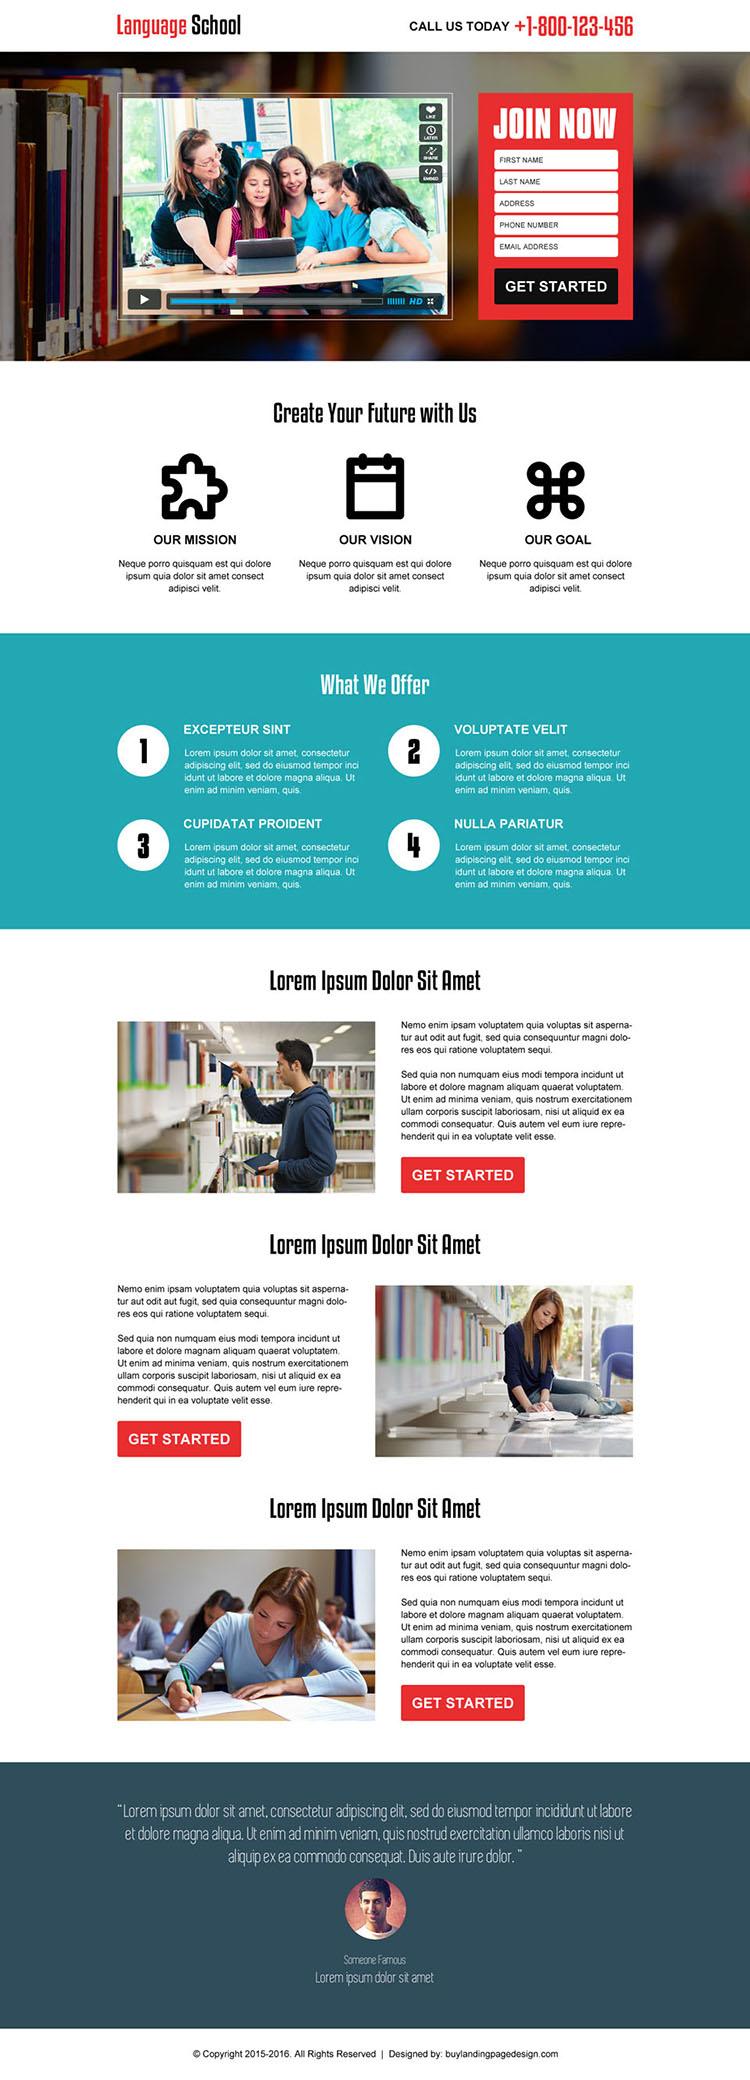 best education video responsive converting landing page design